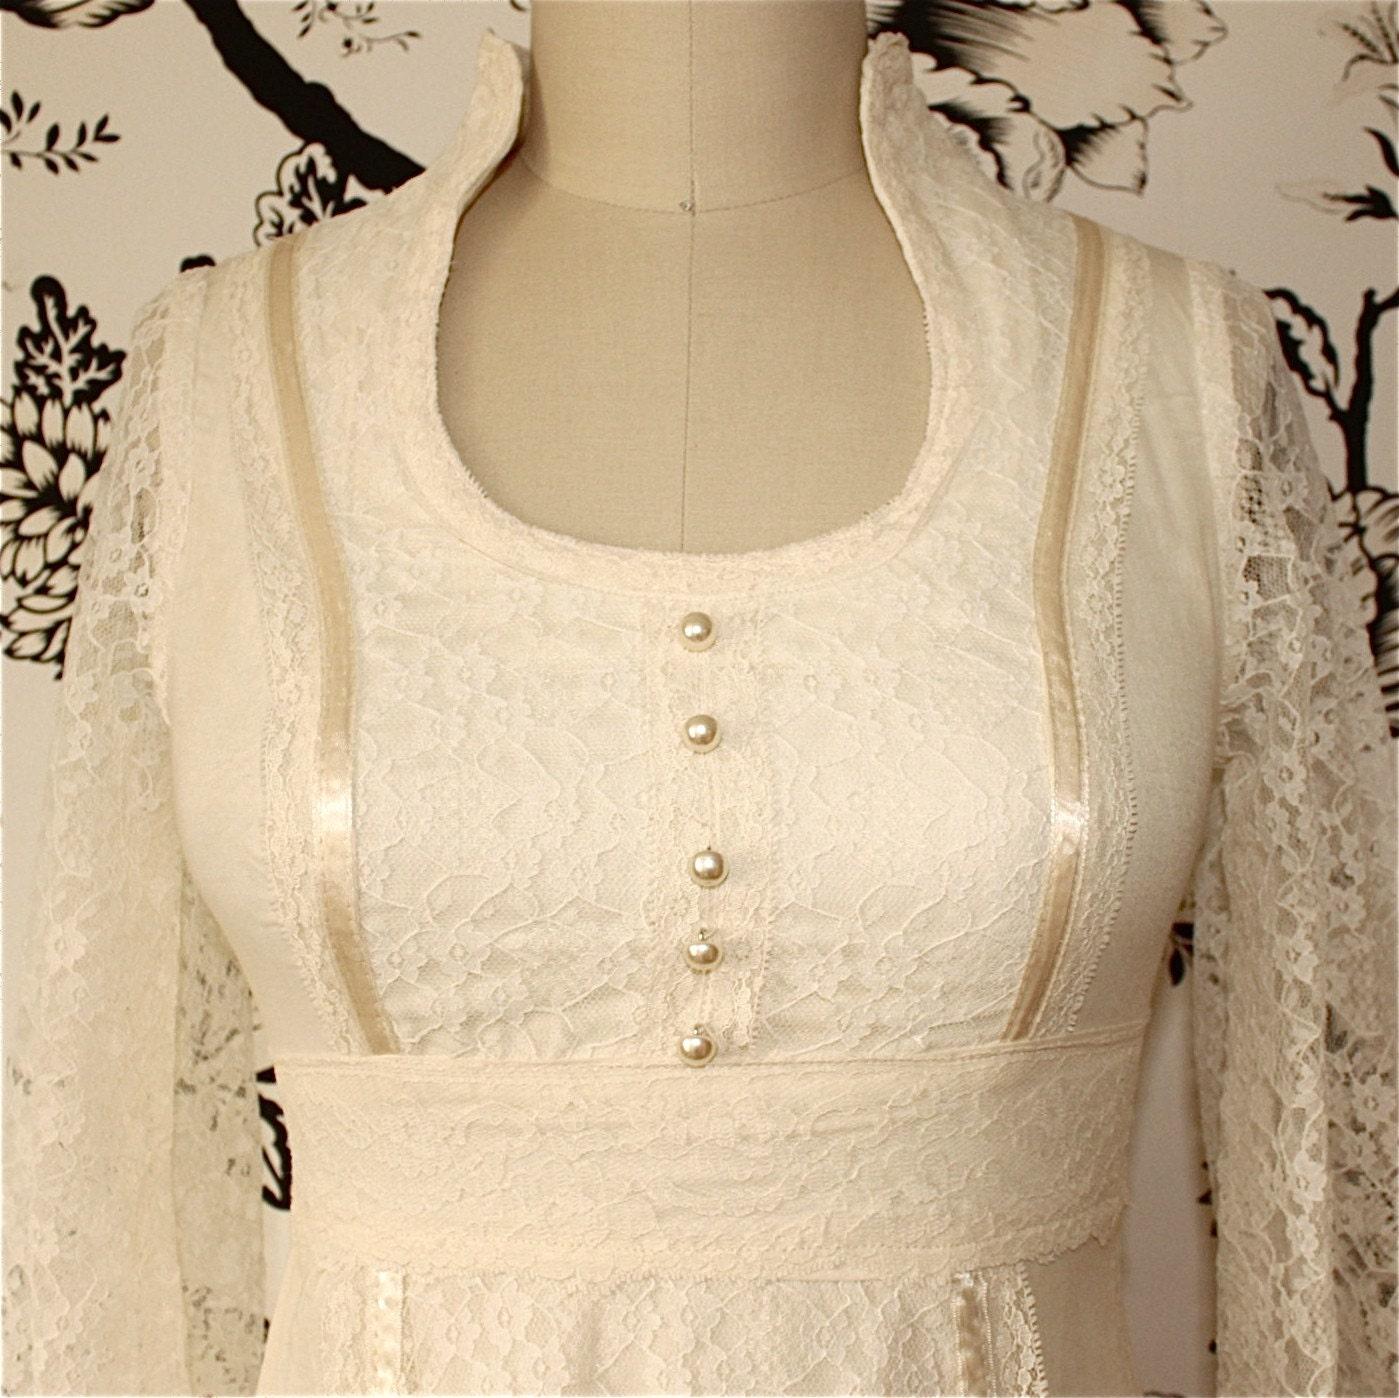 CREAM cotton LACE vintage LONG SLEEVE wedding DRESS